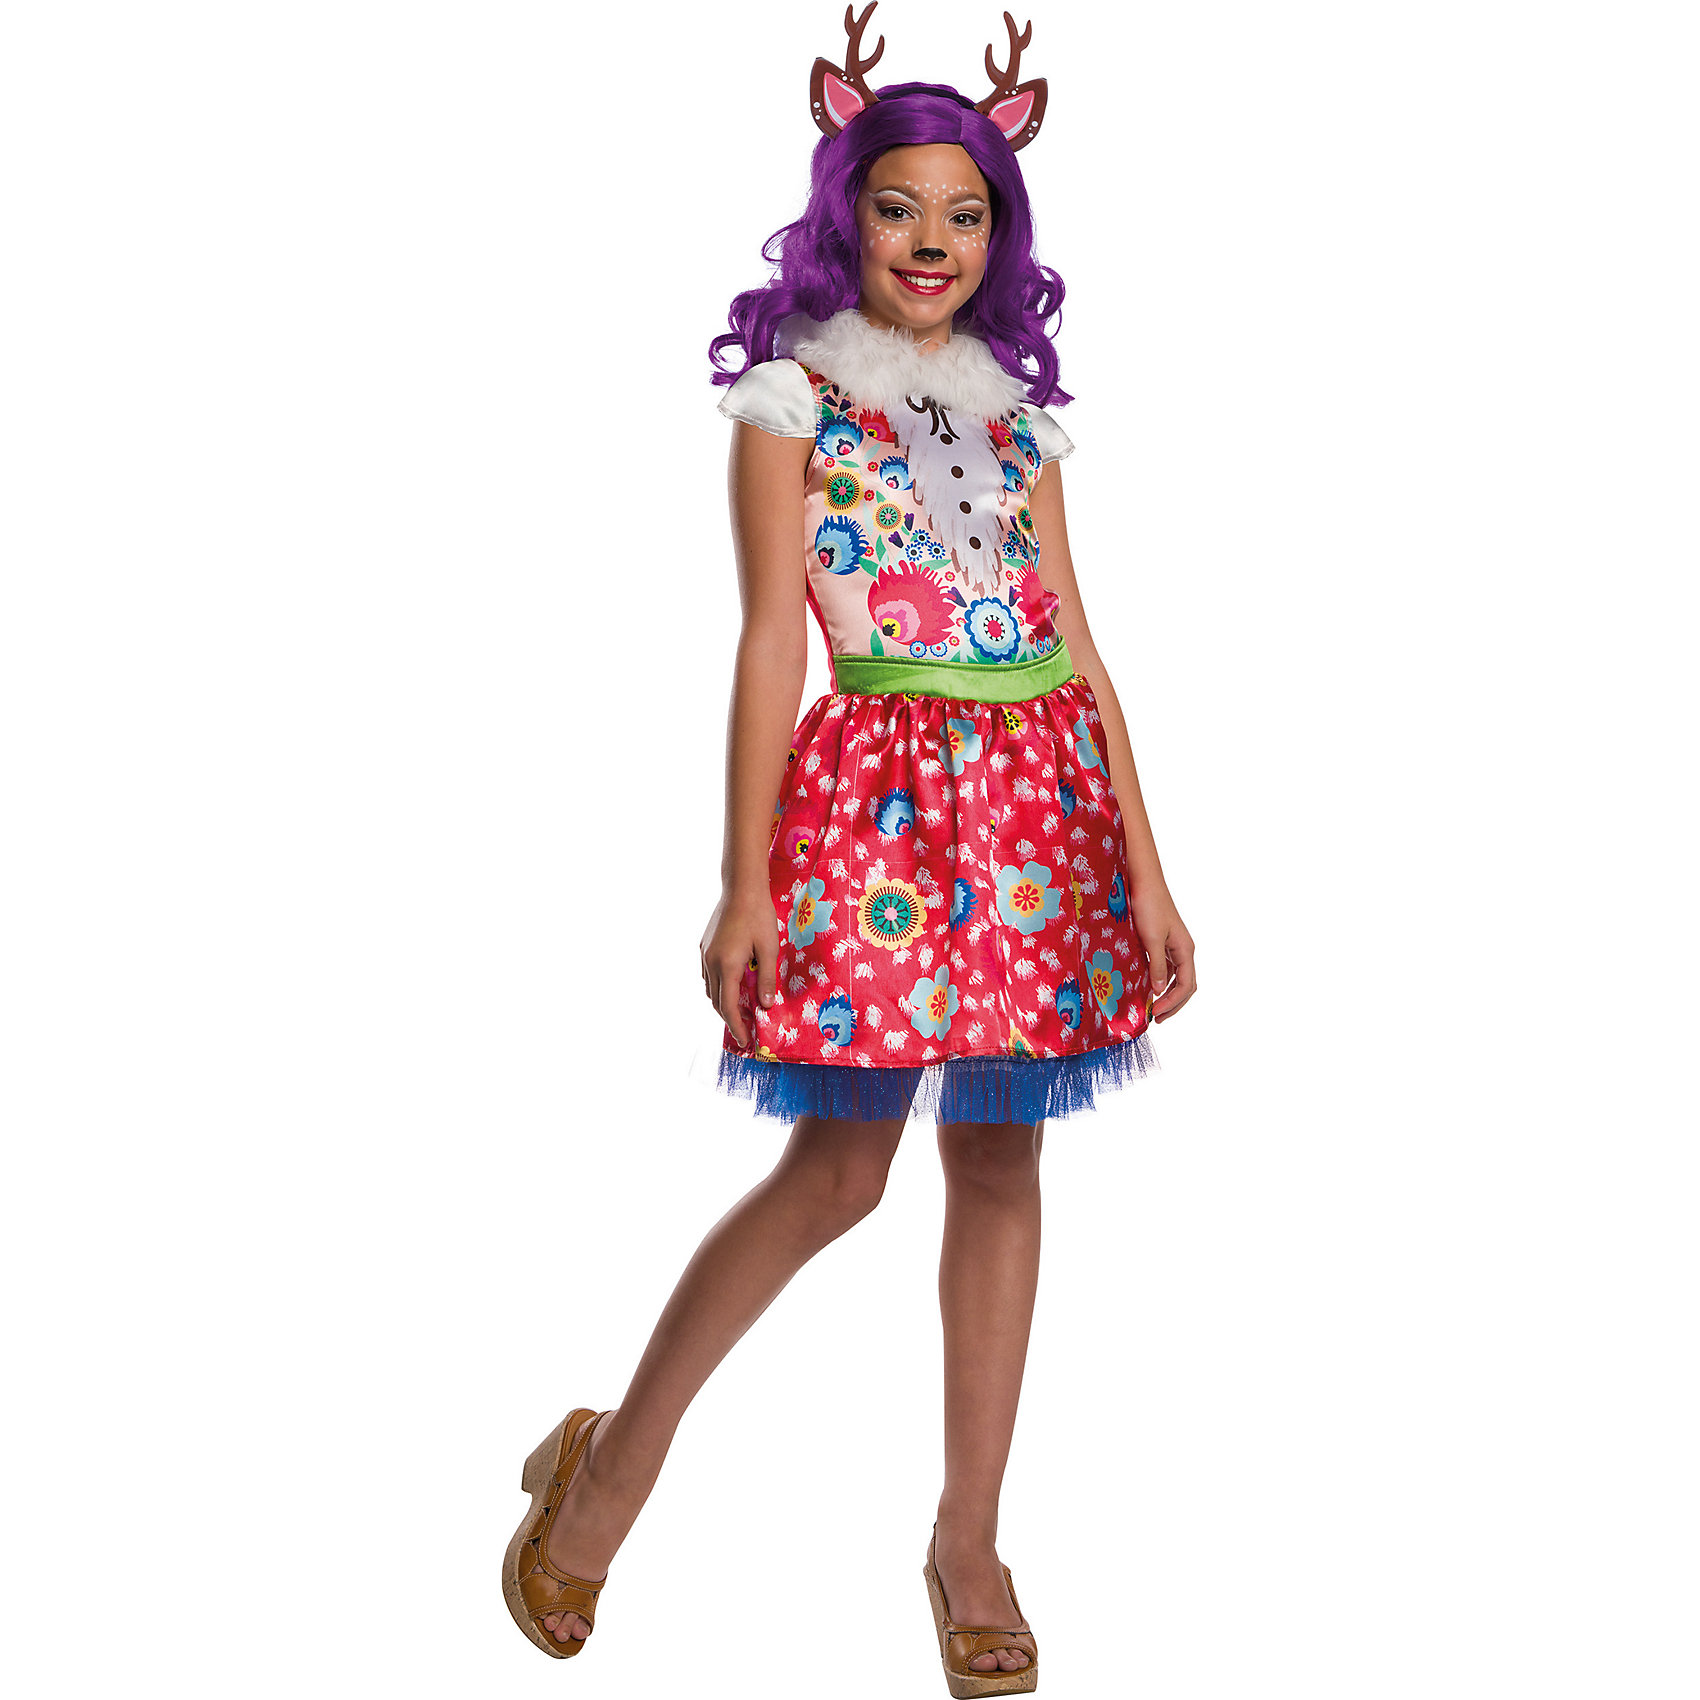 Neu Rubie´s Kostüm Enchantimals Enchantimals Enchantimals Danessa Deer 8731929    Vogue  1a40fa